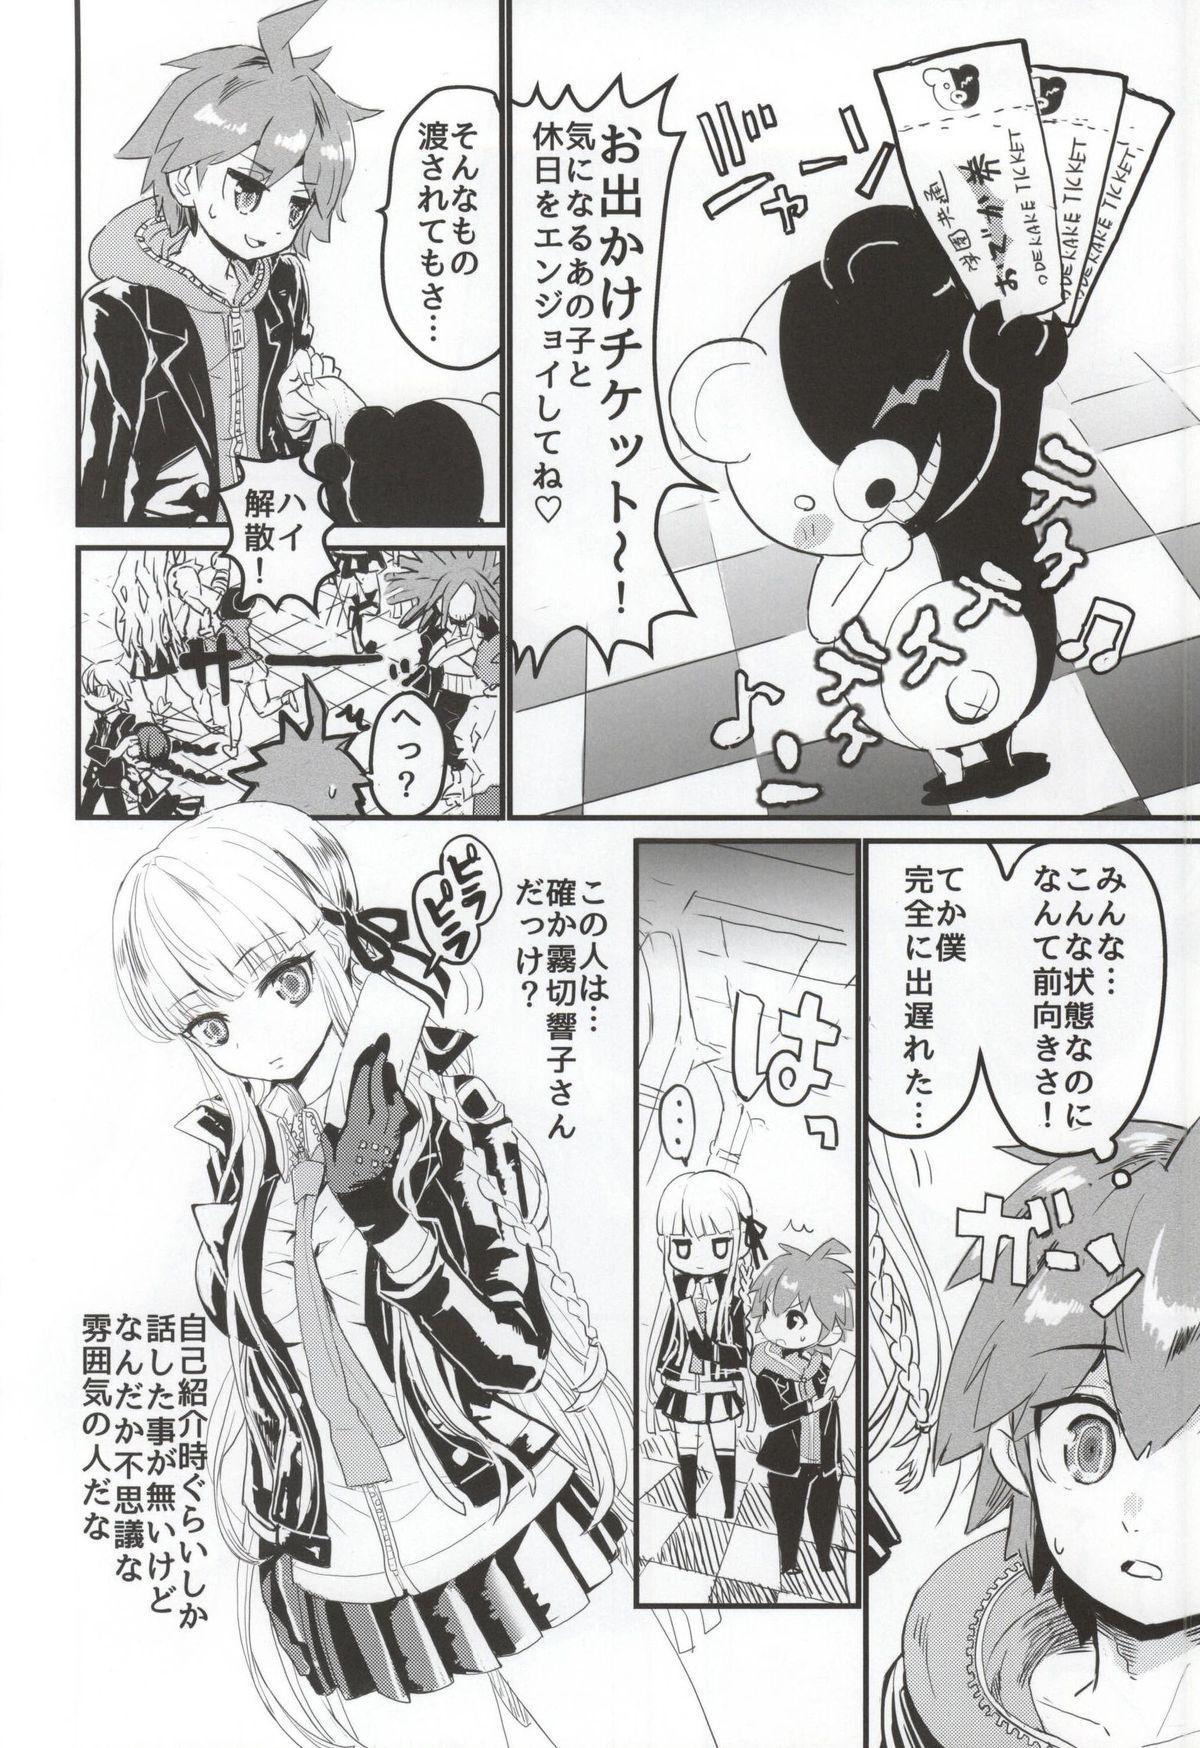 Kirigiri-san to Issho ni School Mode 2